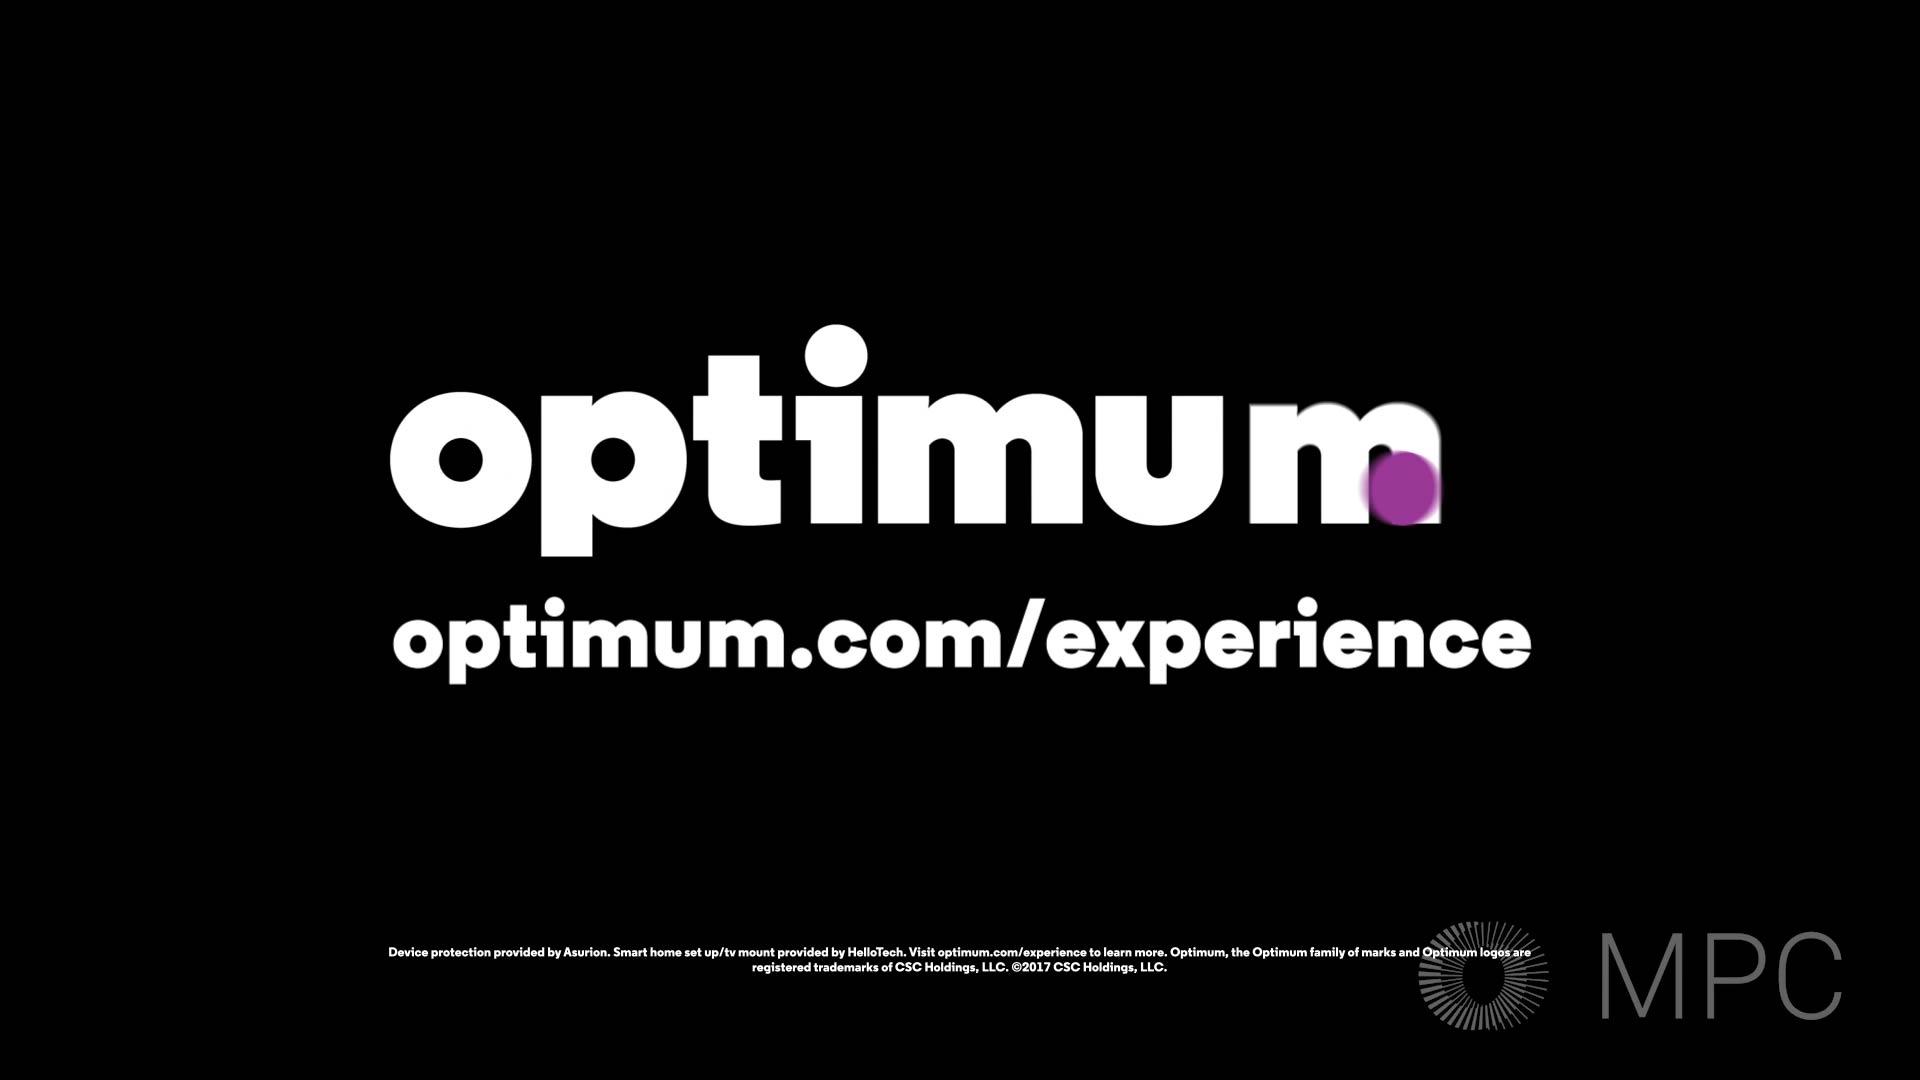 OPTIMUM_05.jpg